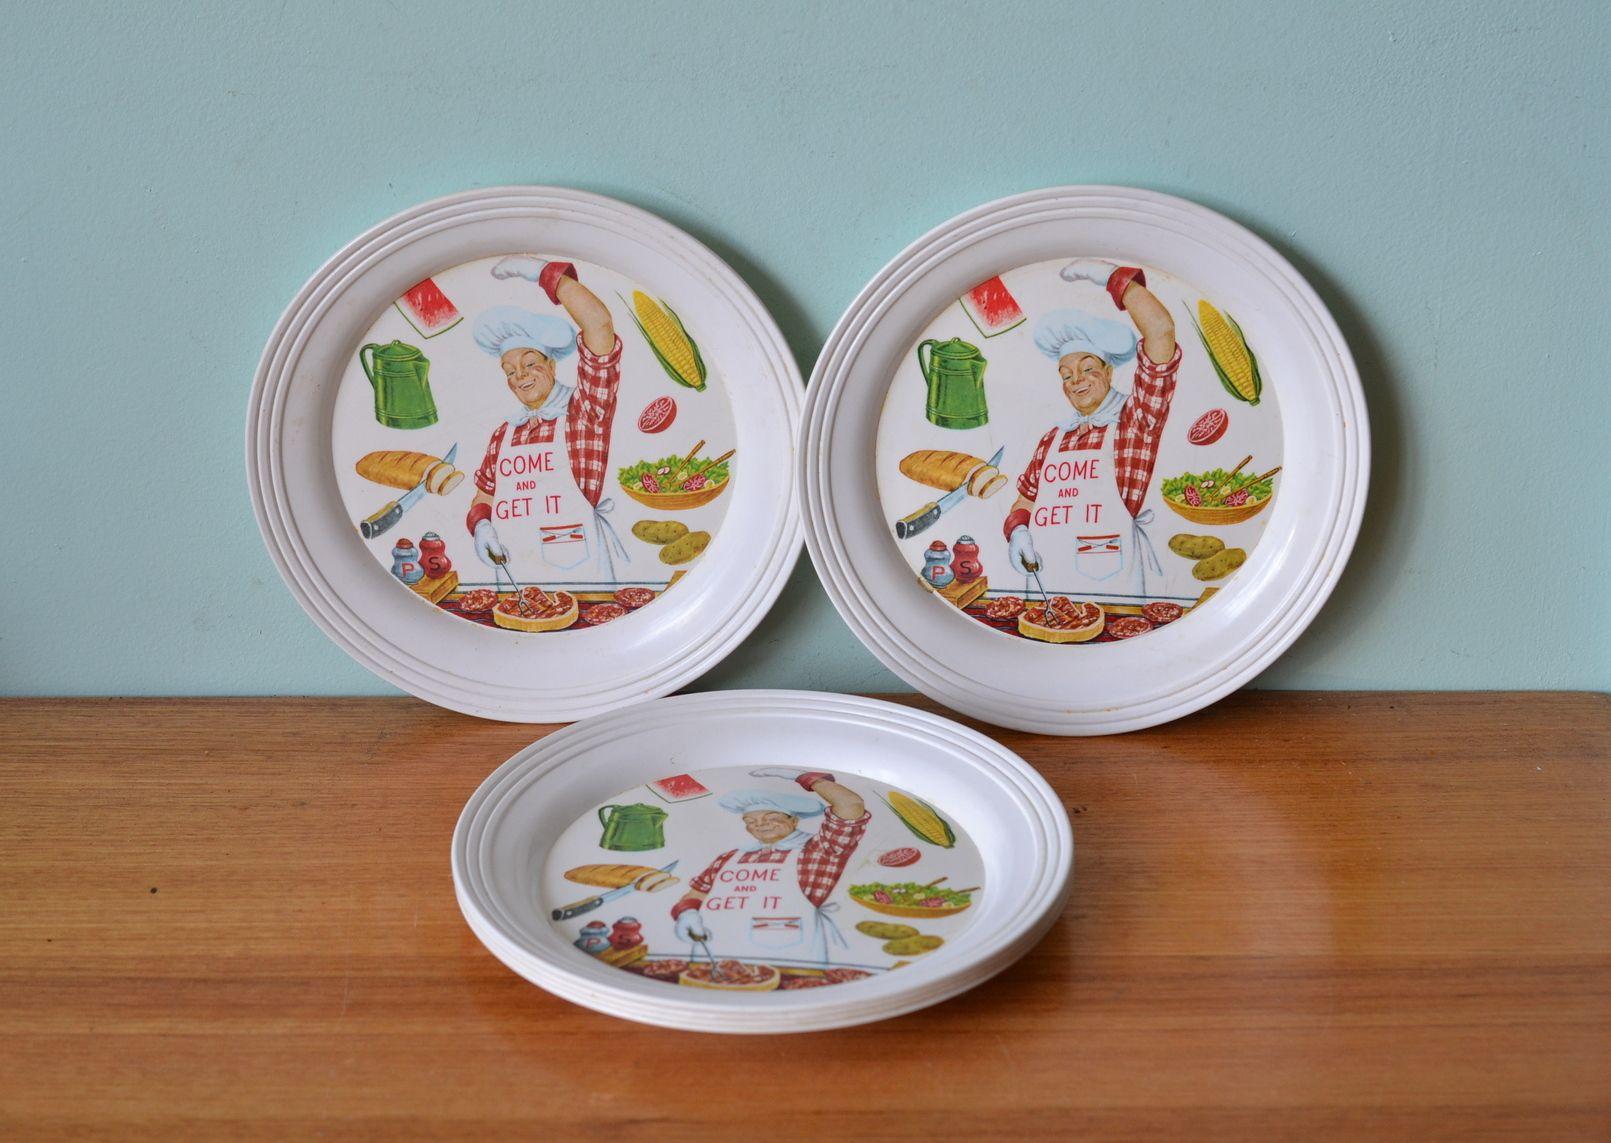 Vintage British plastics plates picnic ware x 6 - Funky Flamingo & Vintage British plastics plates picnic ware x 6 - Funky Flamingo ...